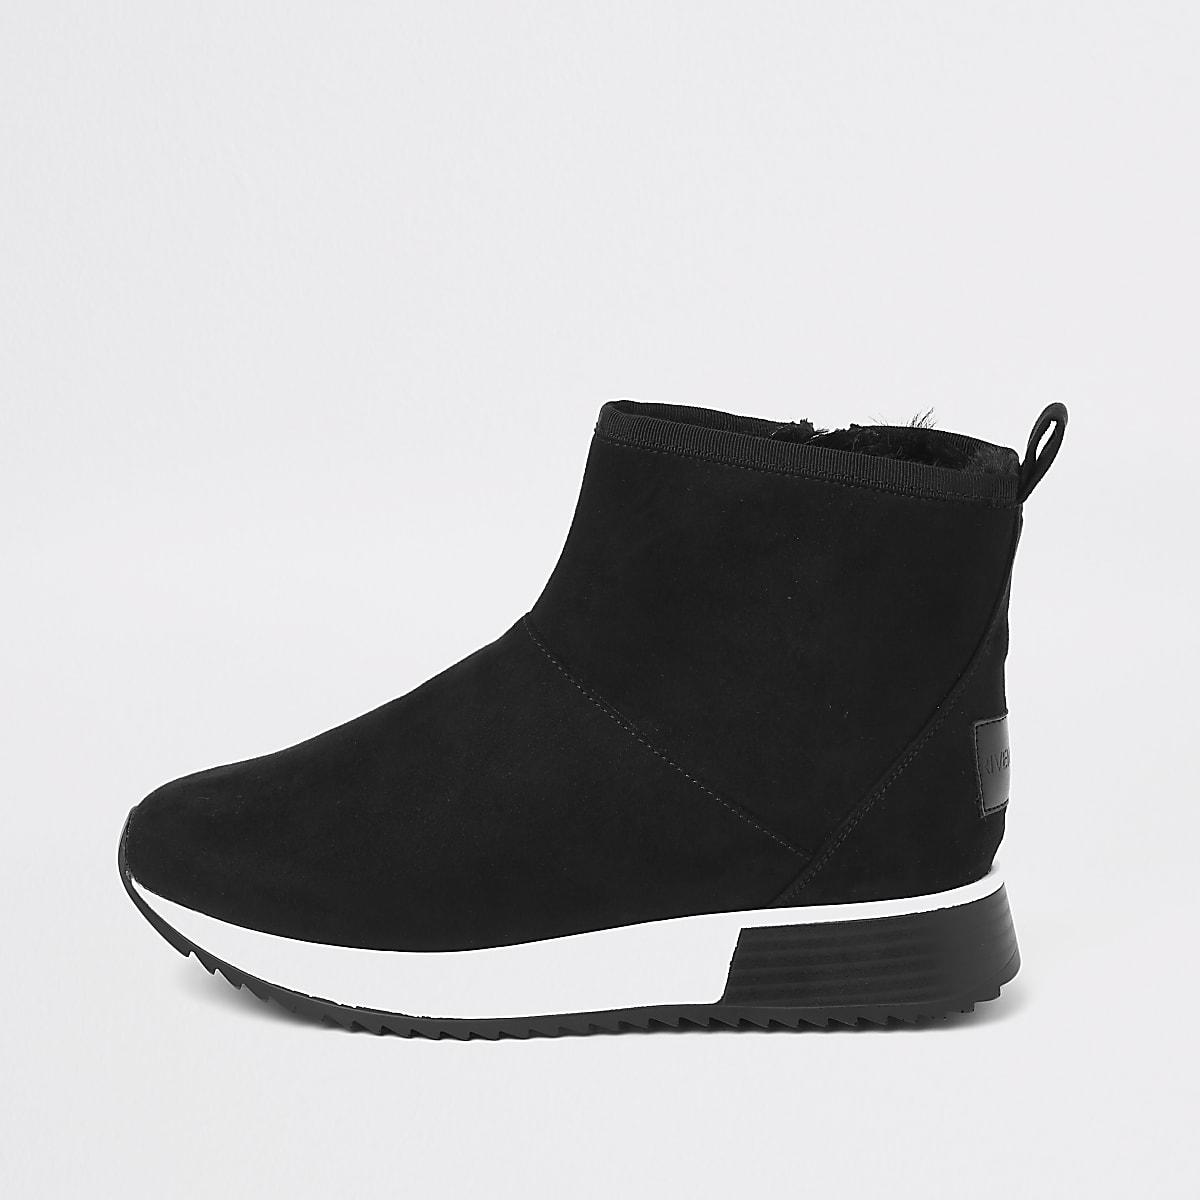 791626b9cd434 Black faux fur trim hi-top runner trainers - Trainers - Shoes & Boots -  women